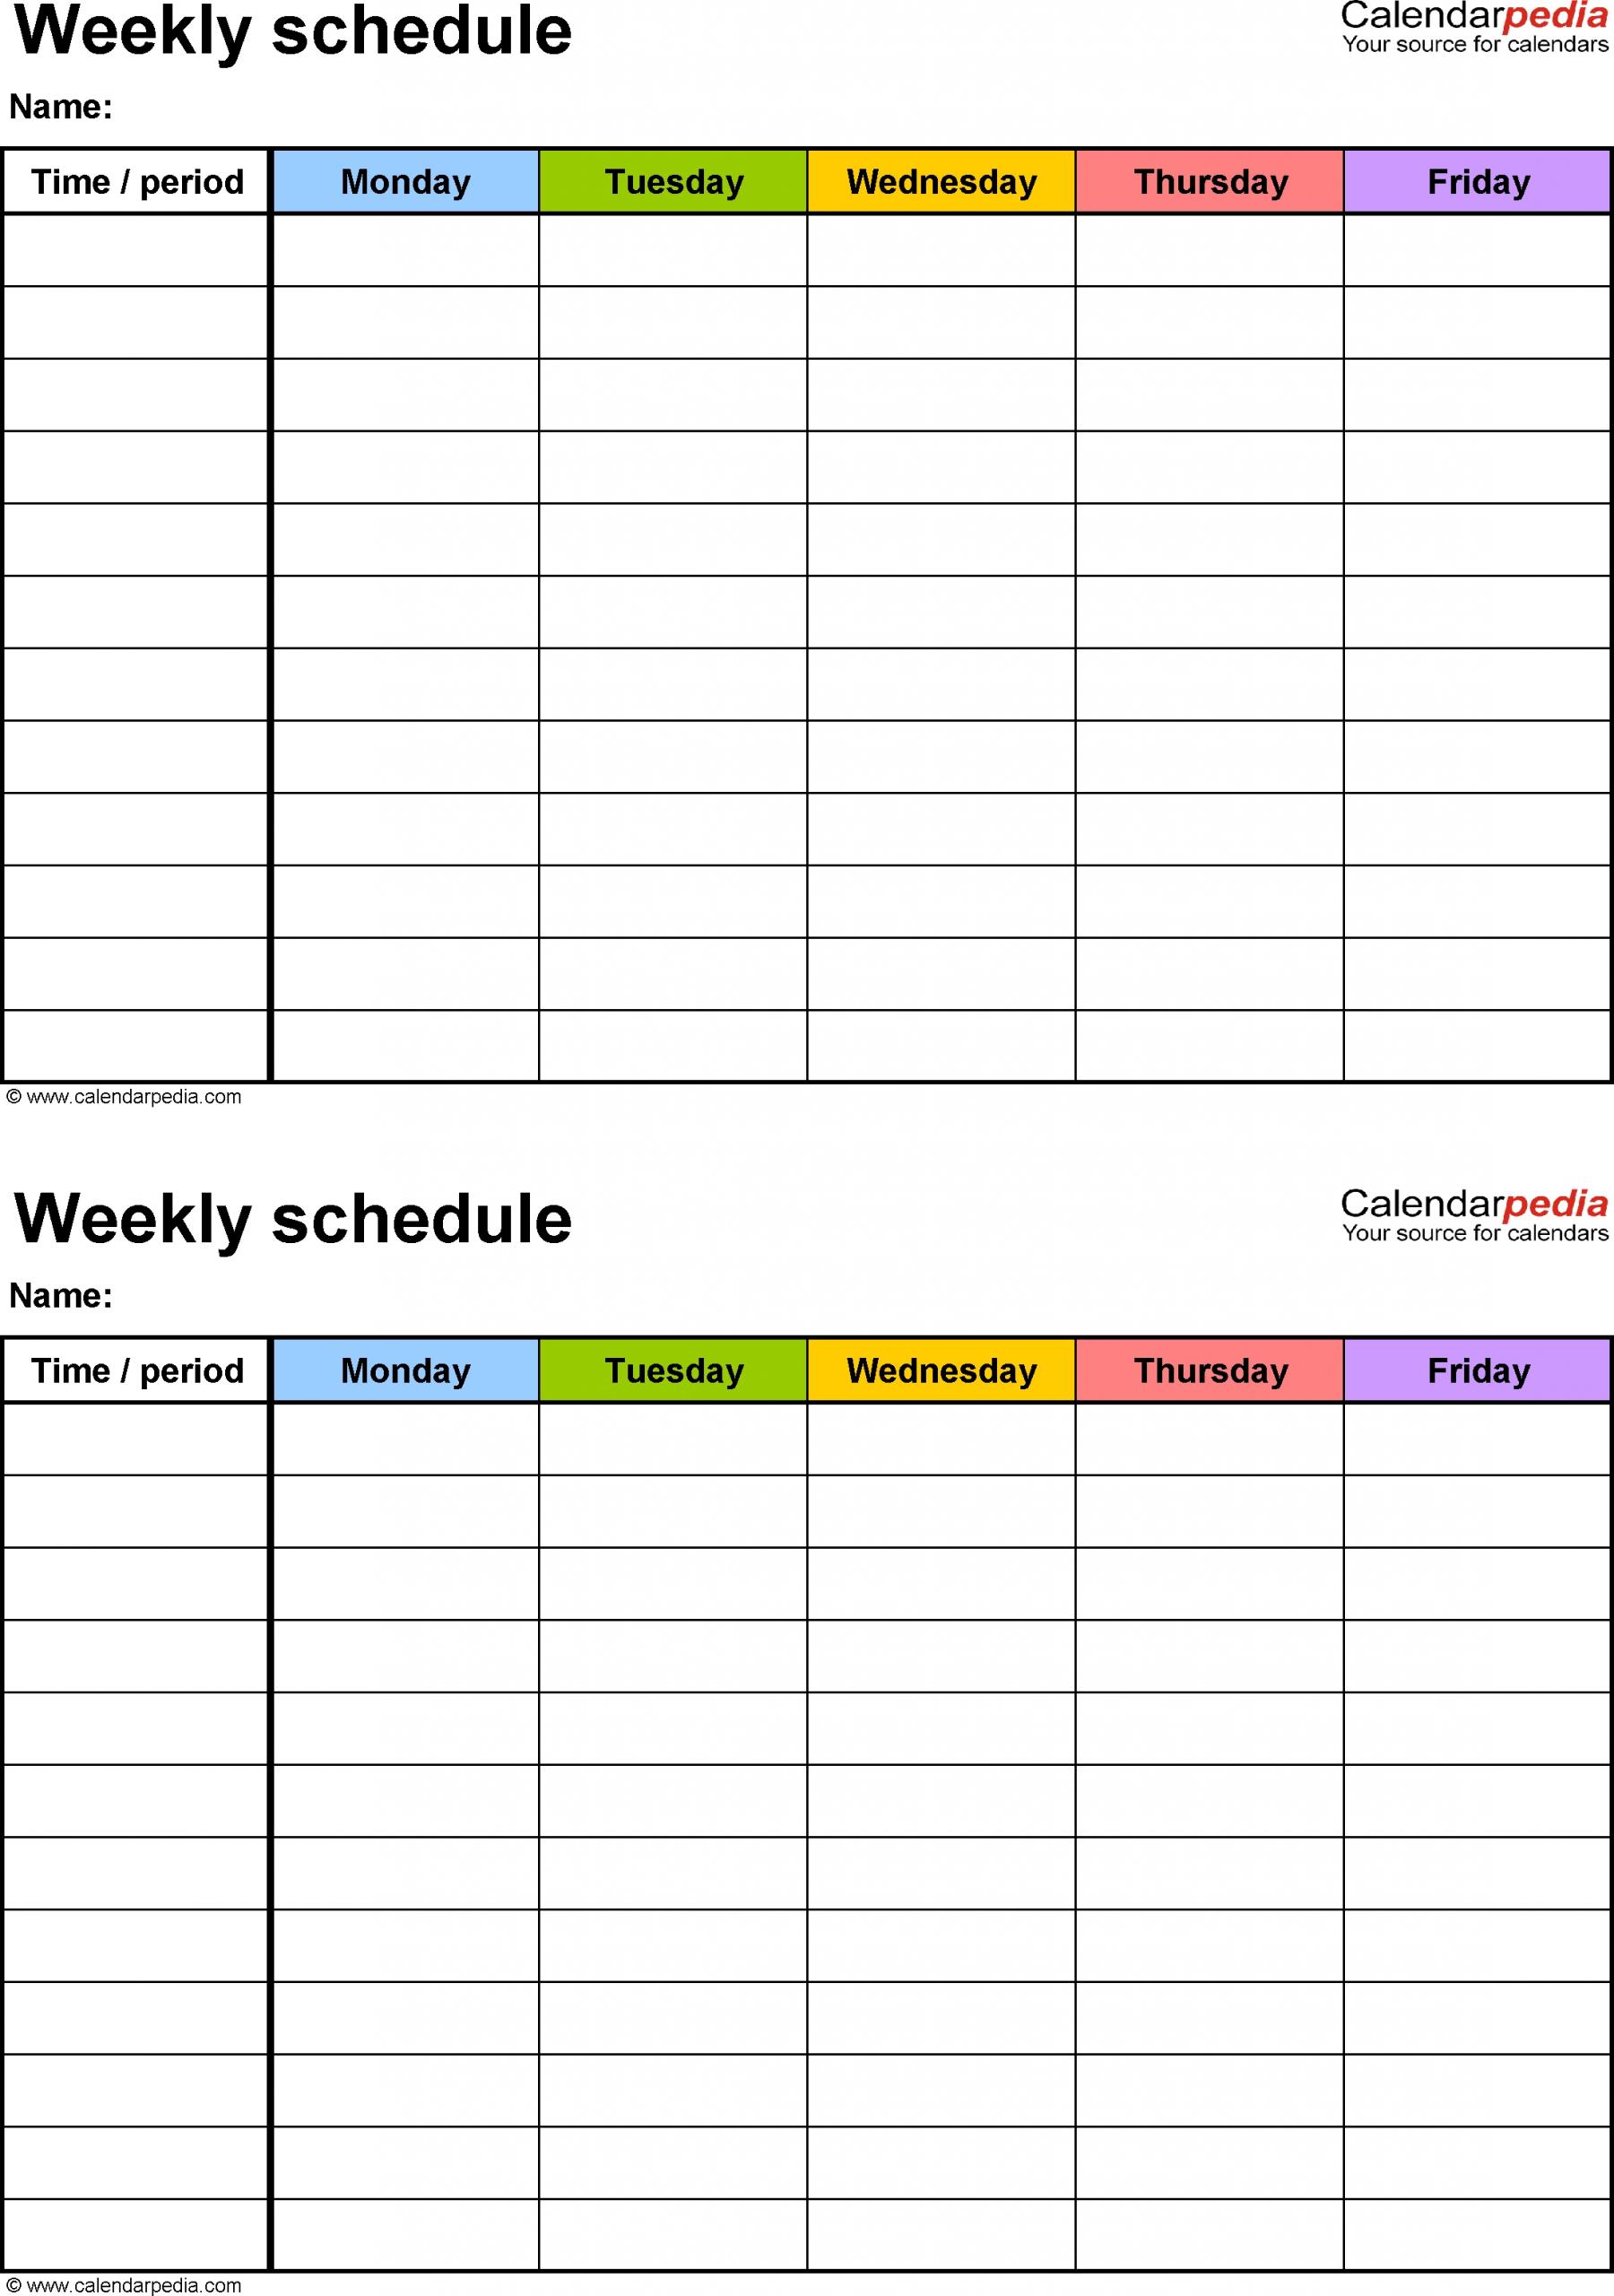 Printable Weekly Schedule Monday Thru Friday - Calendar Mon Thru Fri Weekly Planner Printable